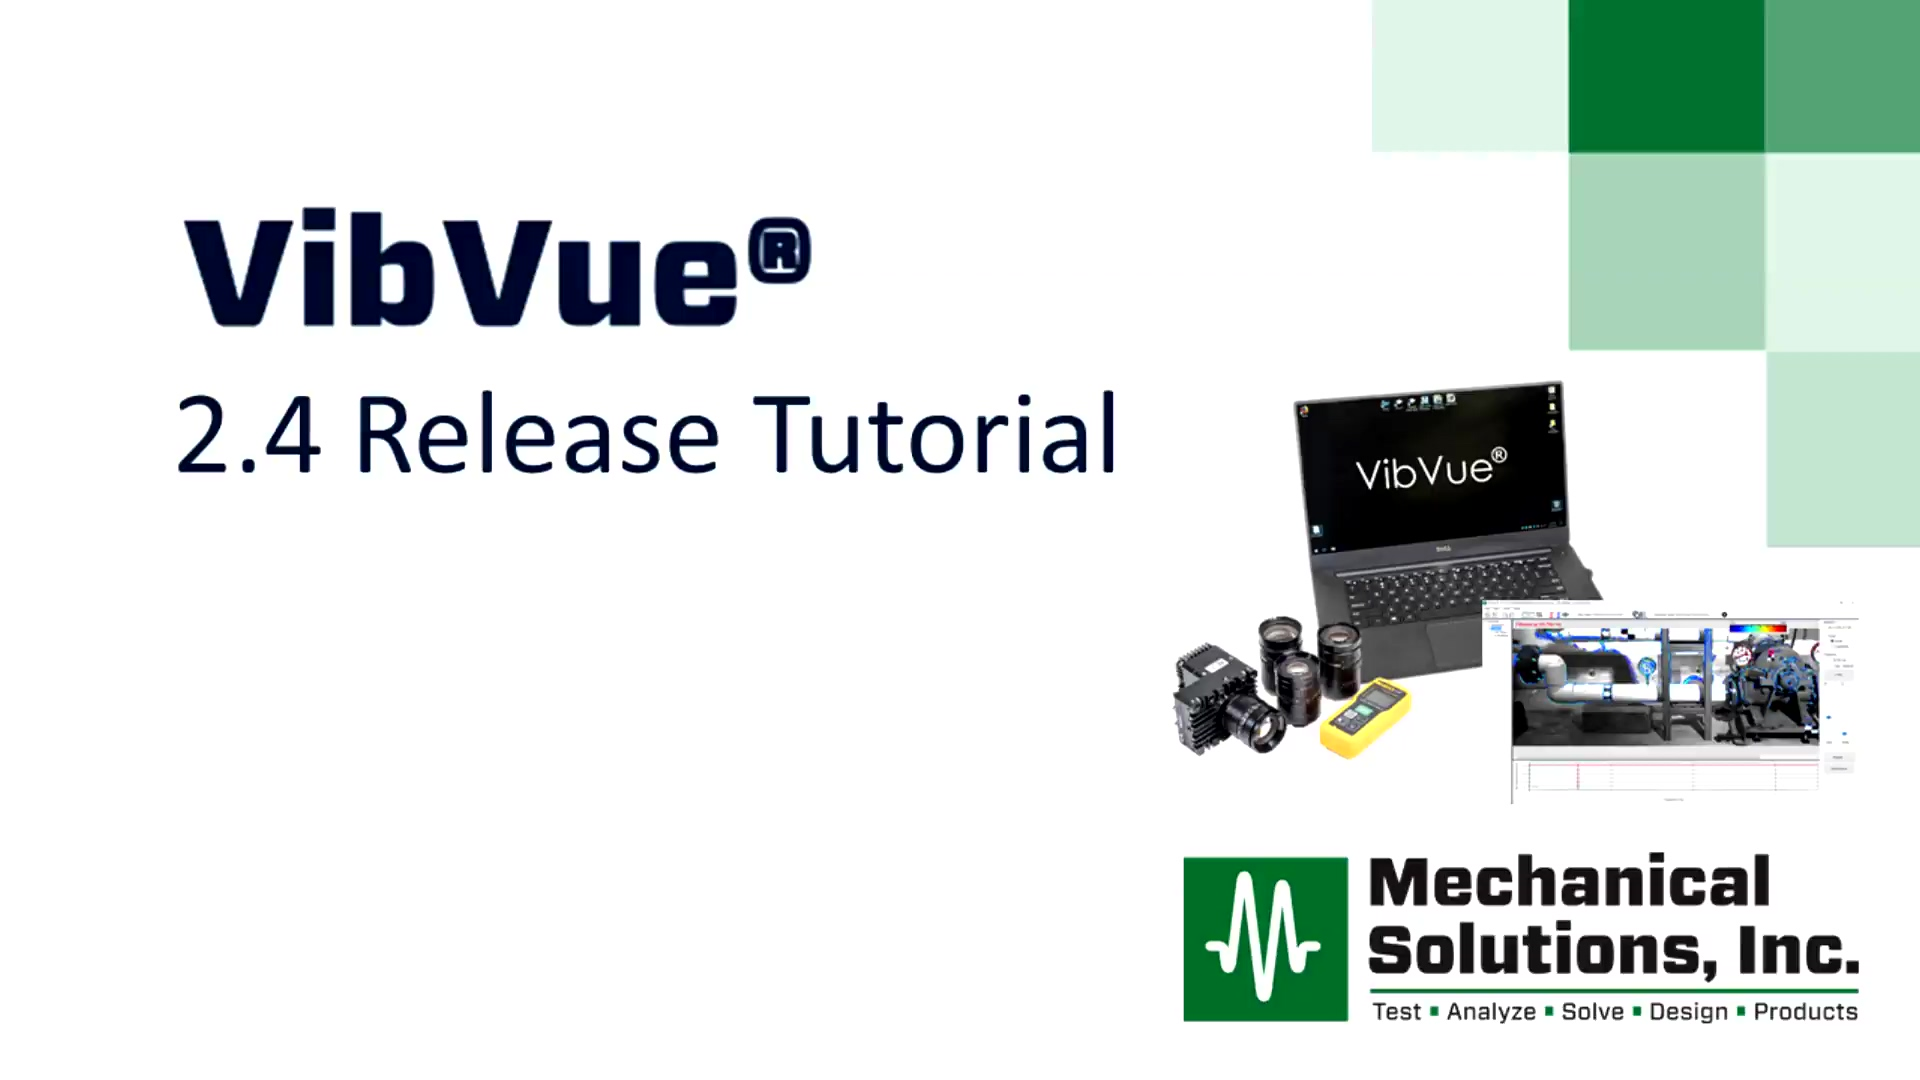 VibVue® 2.4 Release Tutorial